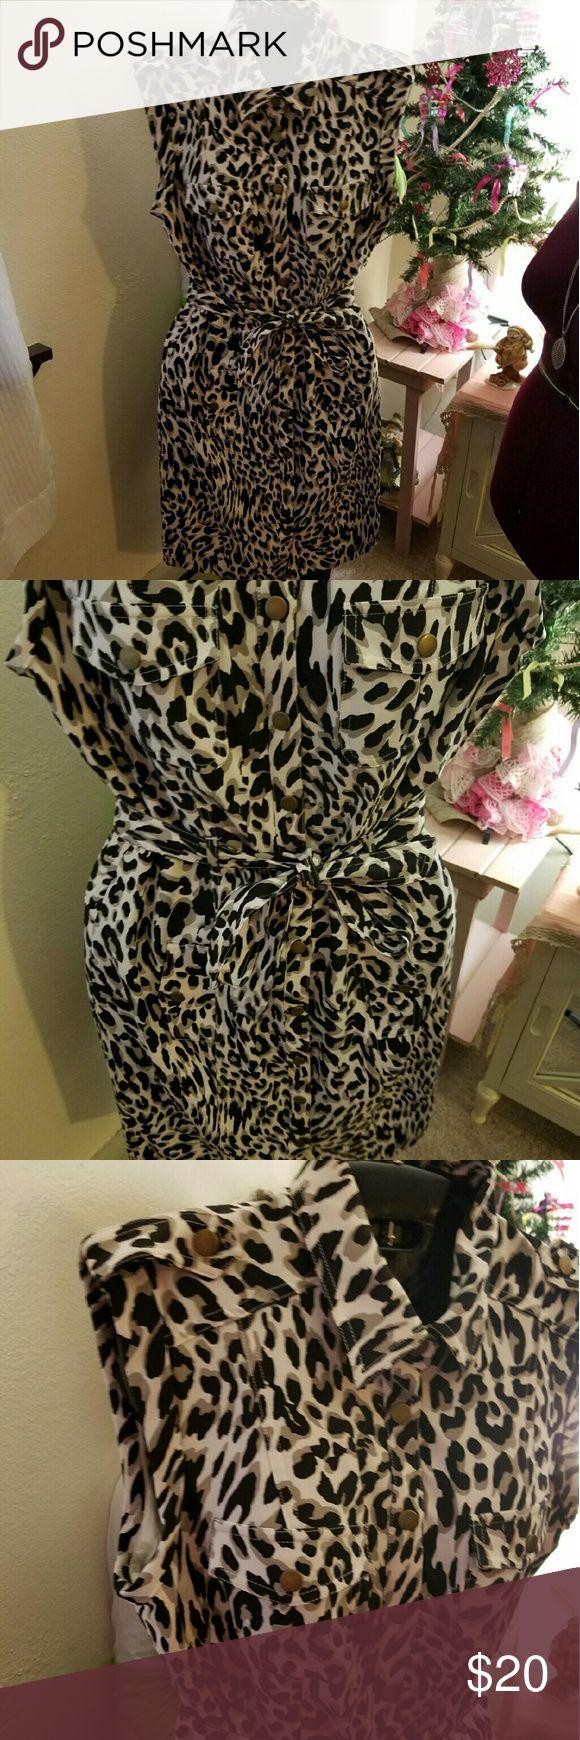 Calvin Klein cheetah print Safari dress Tire around waist for cinching cap sleeves button details about the dress Calvin Klein Dresses Midi